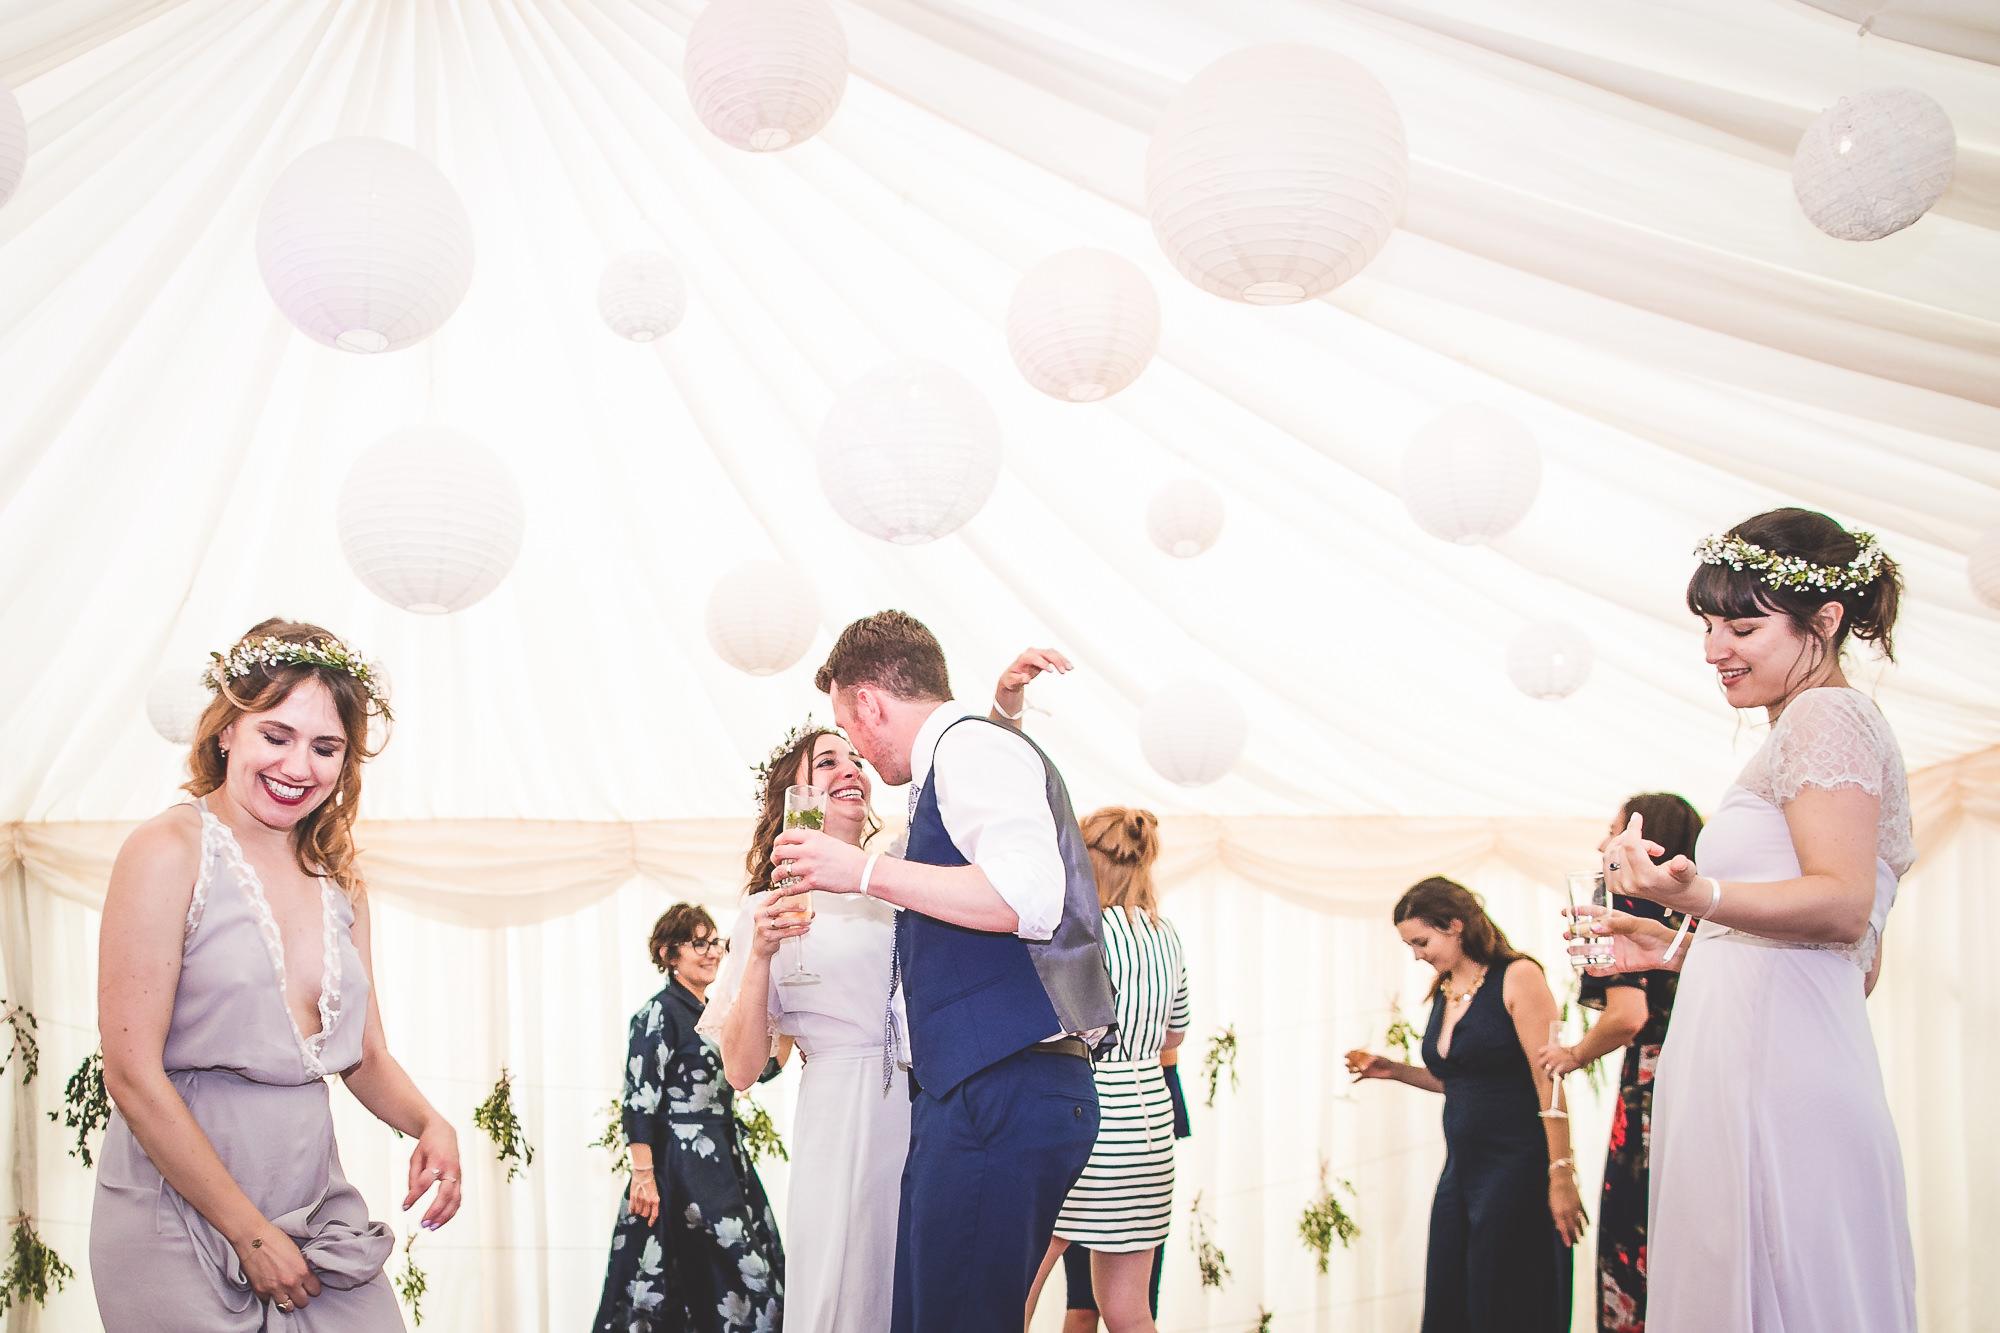 Veils & Bales Wedding Photography | Charlie & Steve SCSS 315